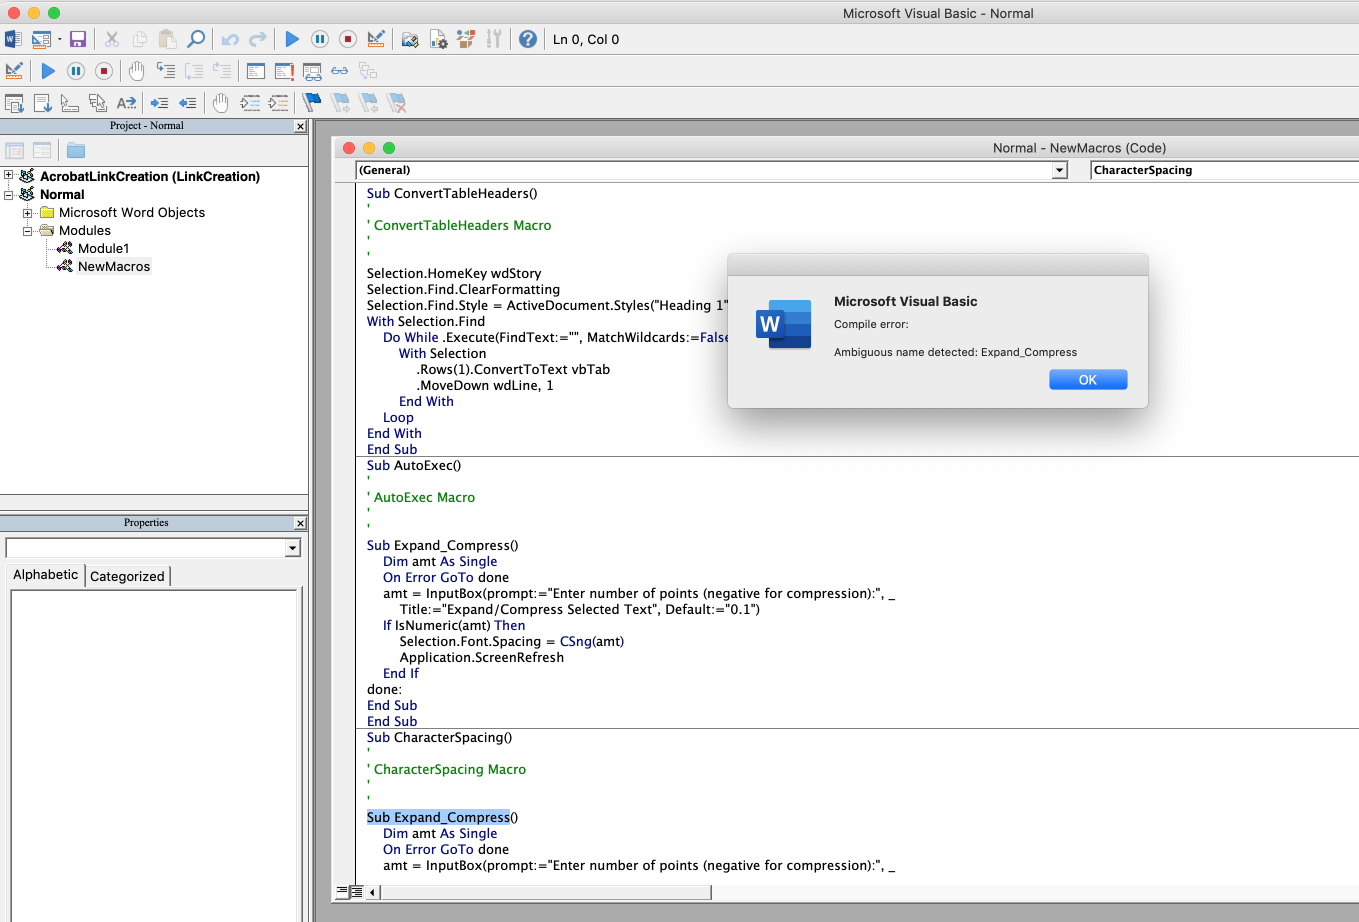 Word Mac 16 26 - app now opens with VBA error